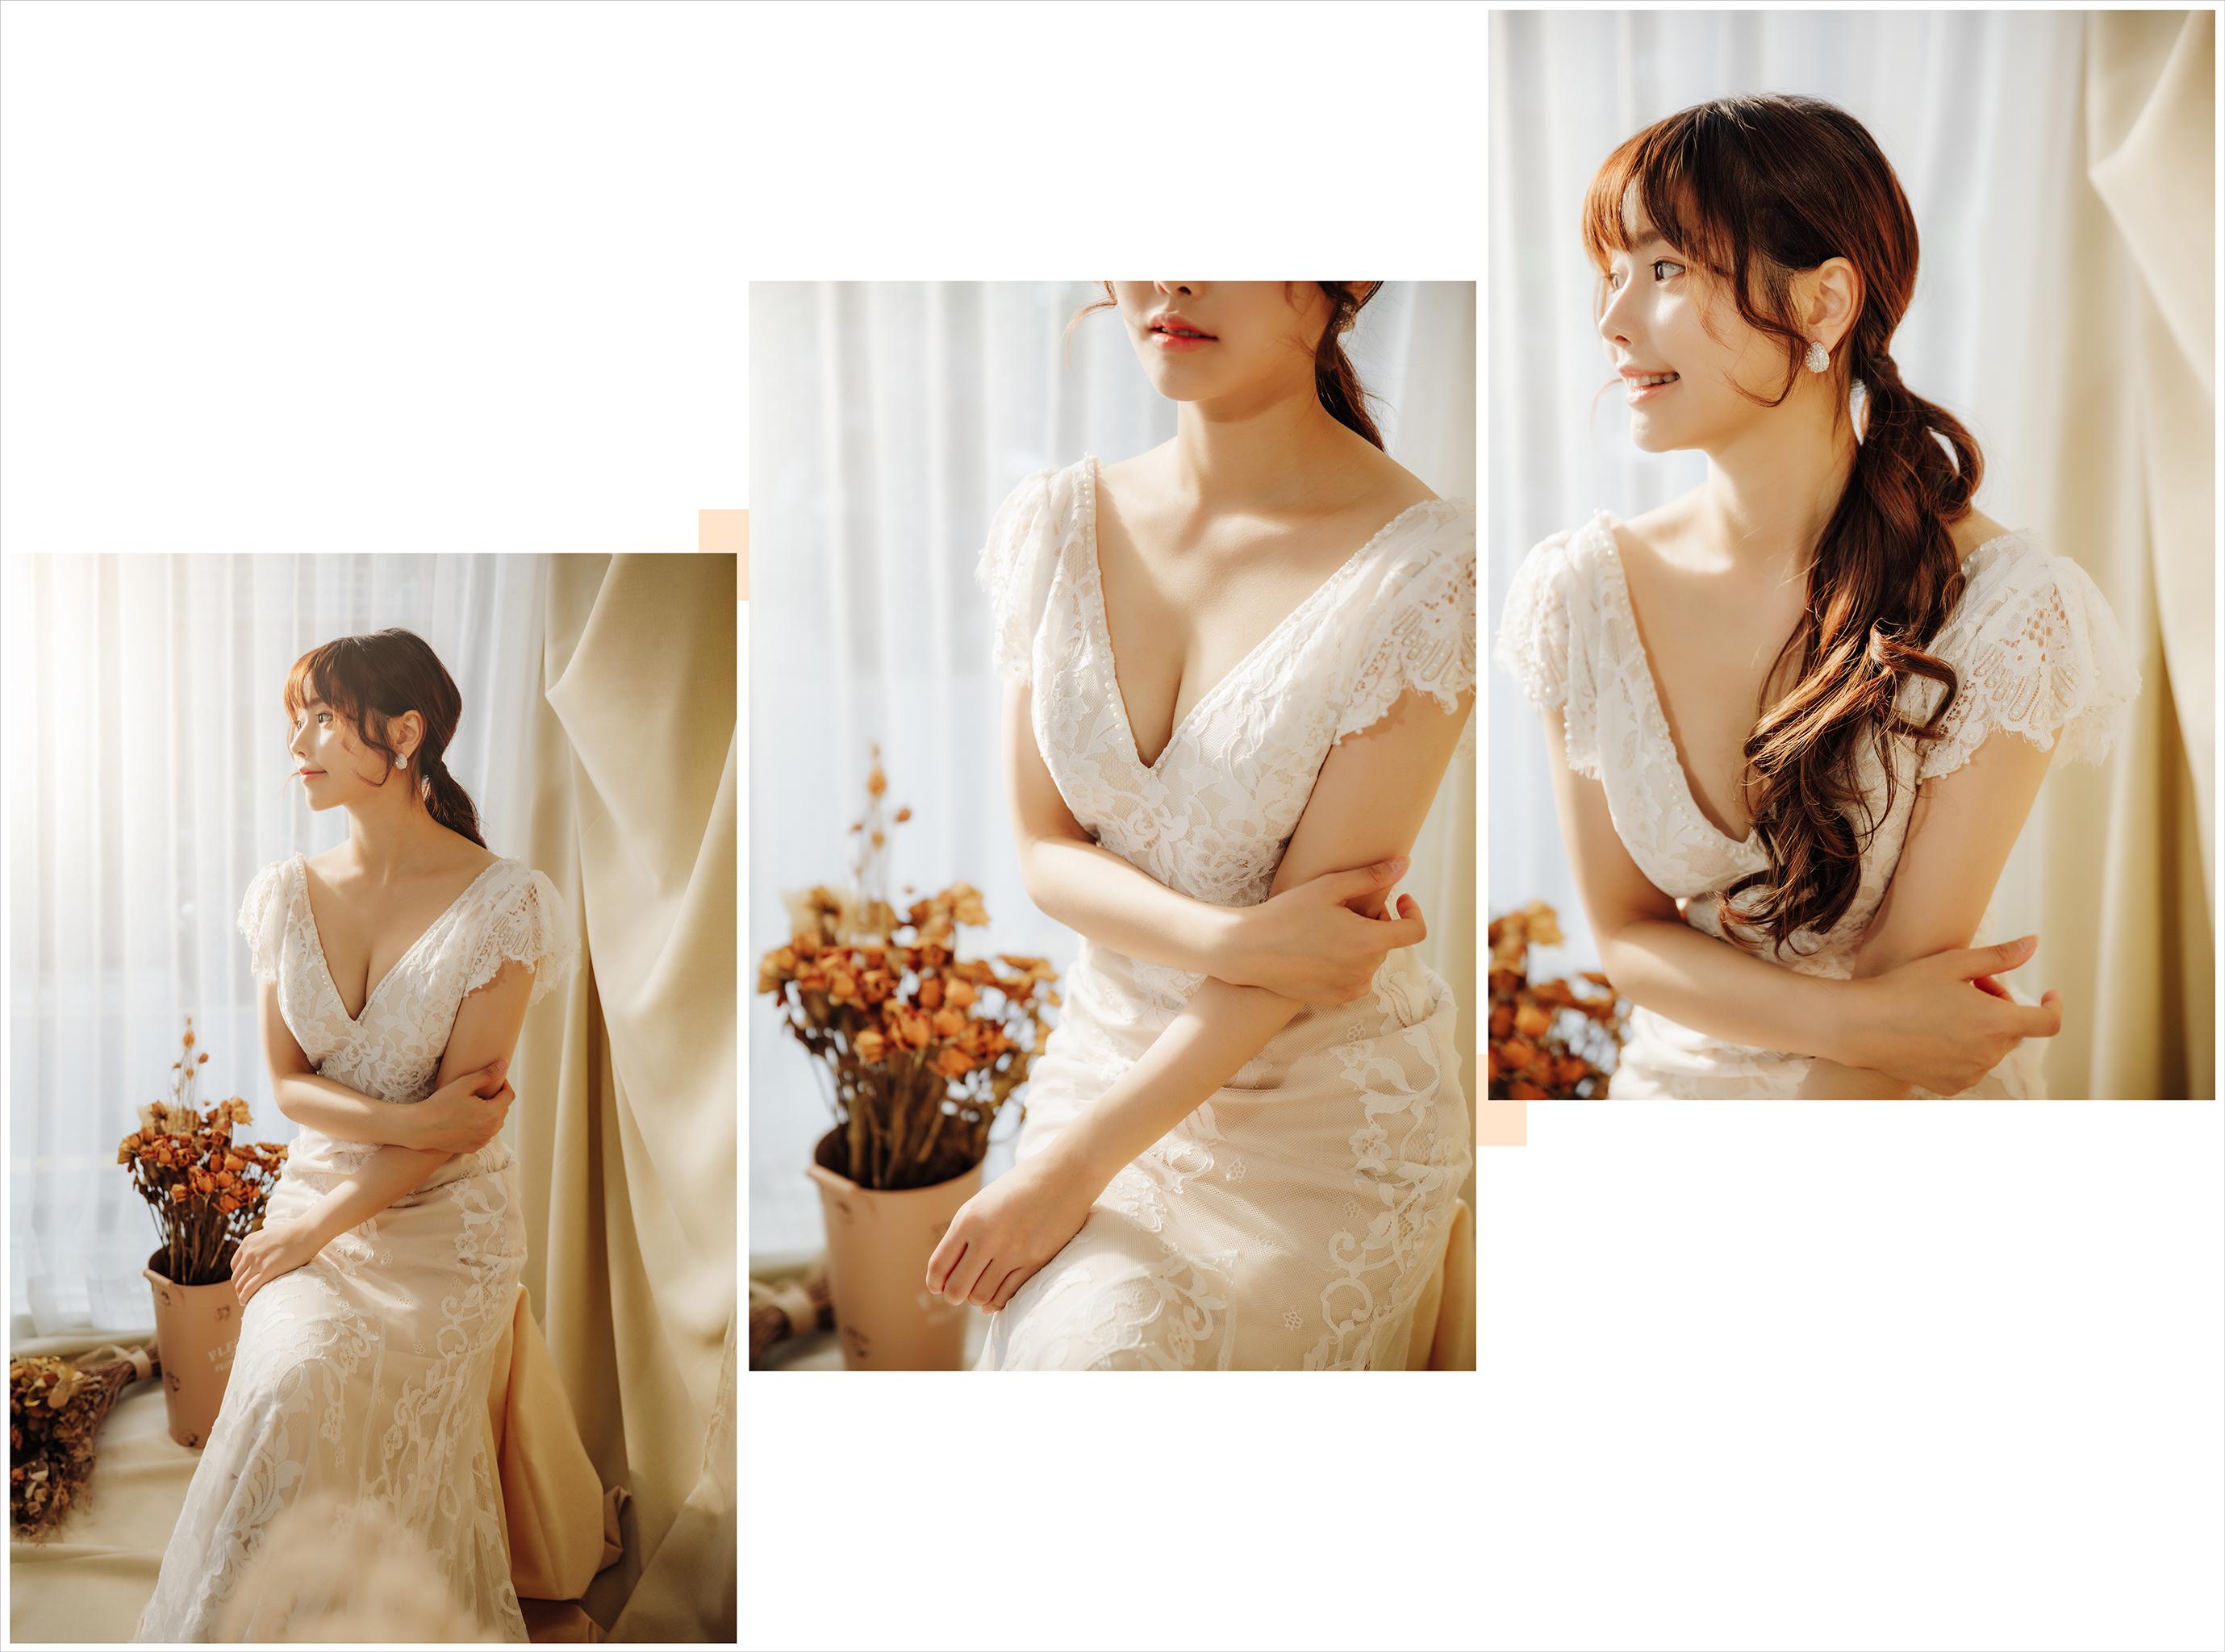 48957162087 8e34497529 o - 【自主婚紗】+Yu+